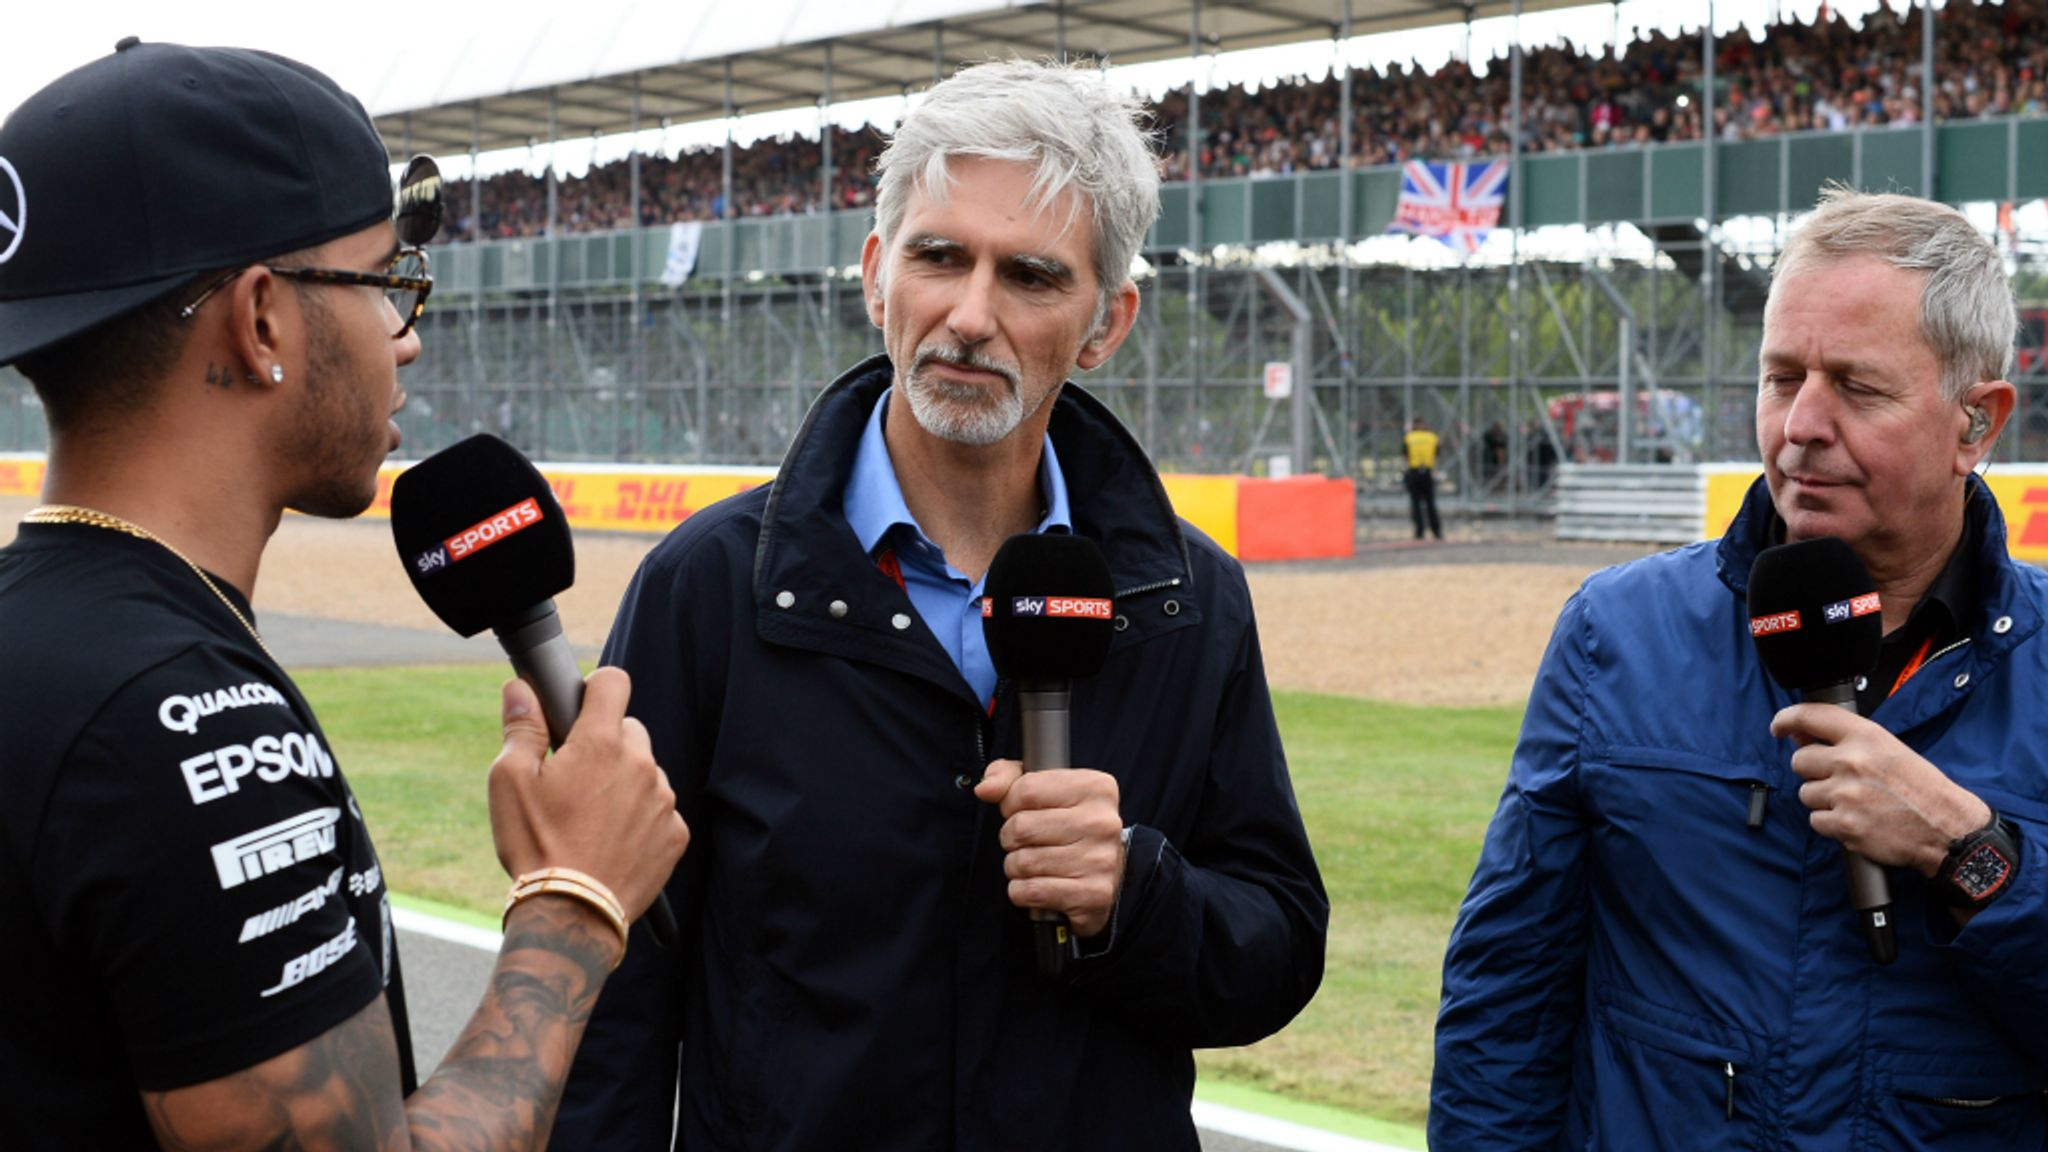 F1, F1 Nation, Damon Hill